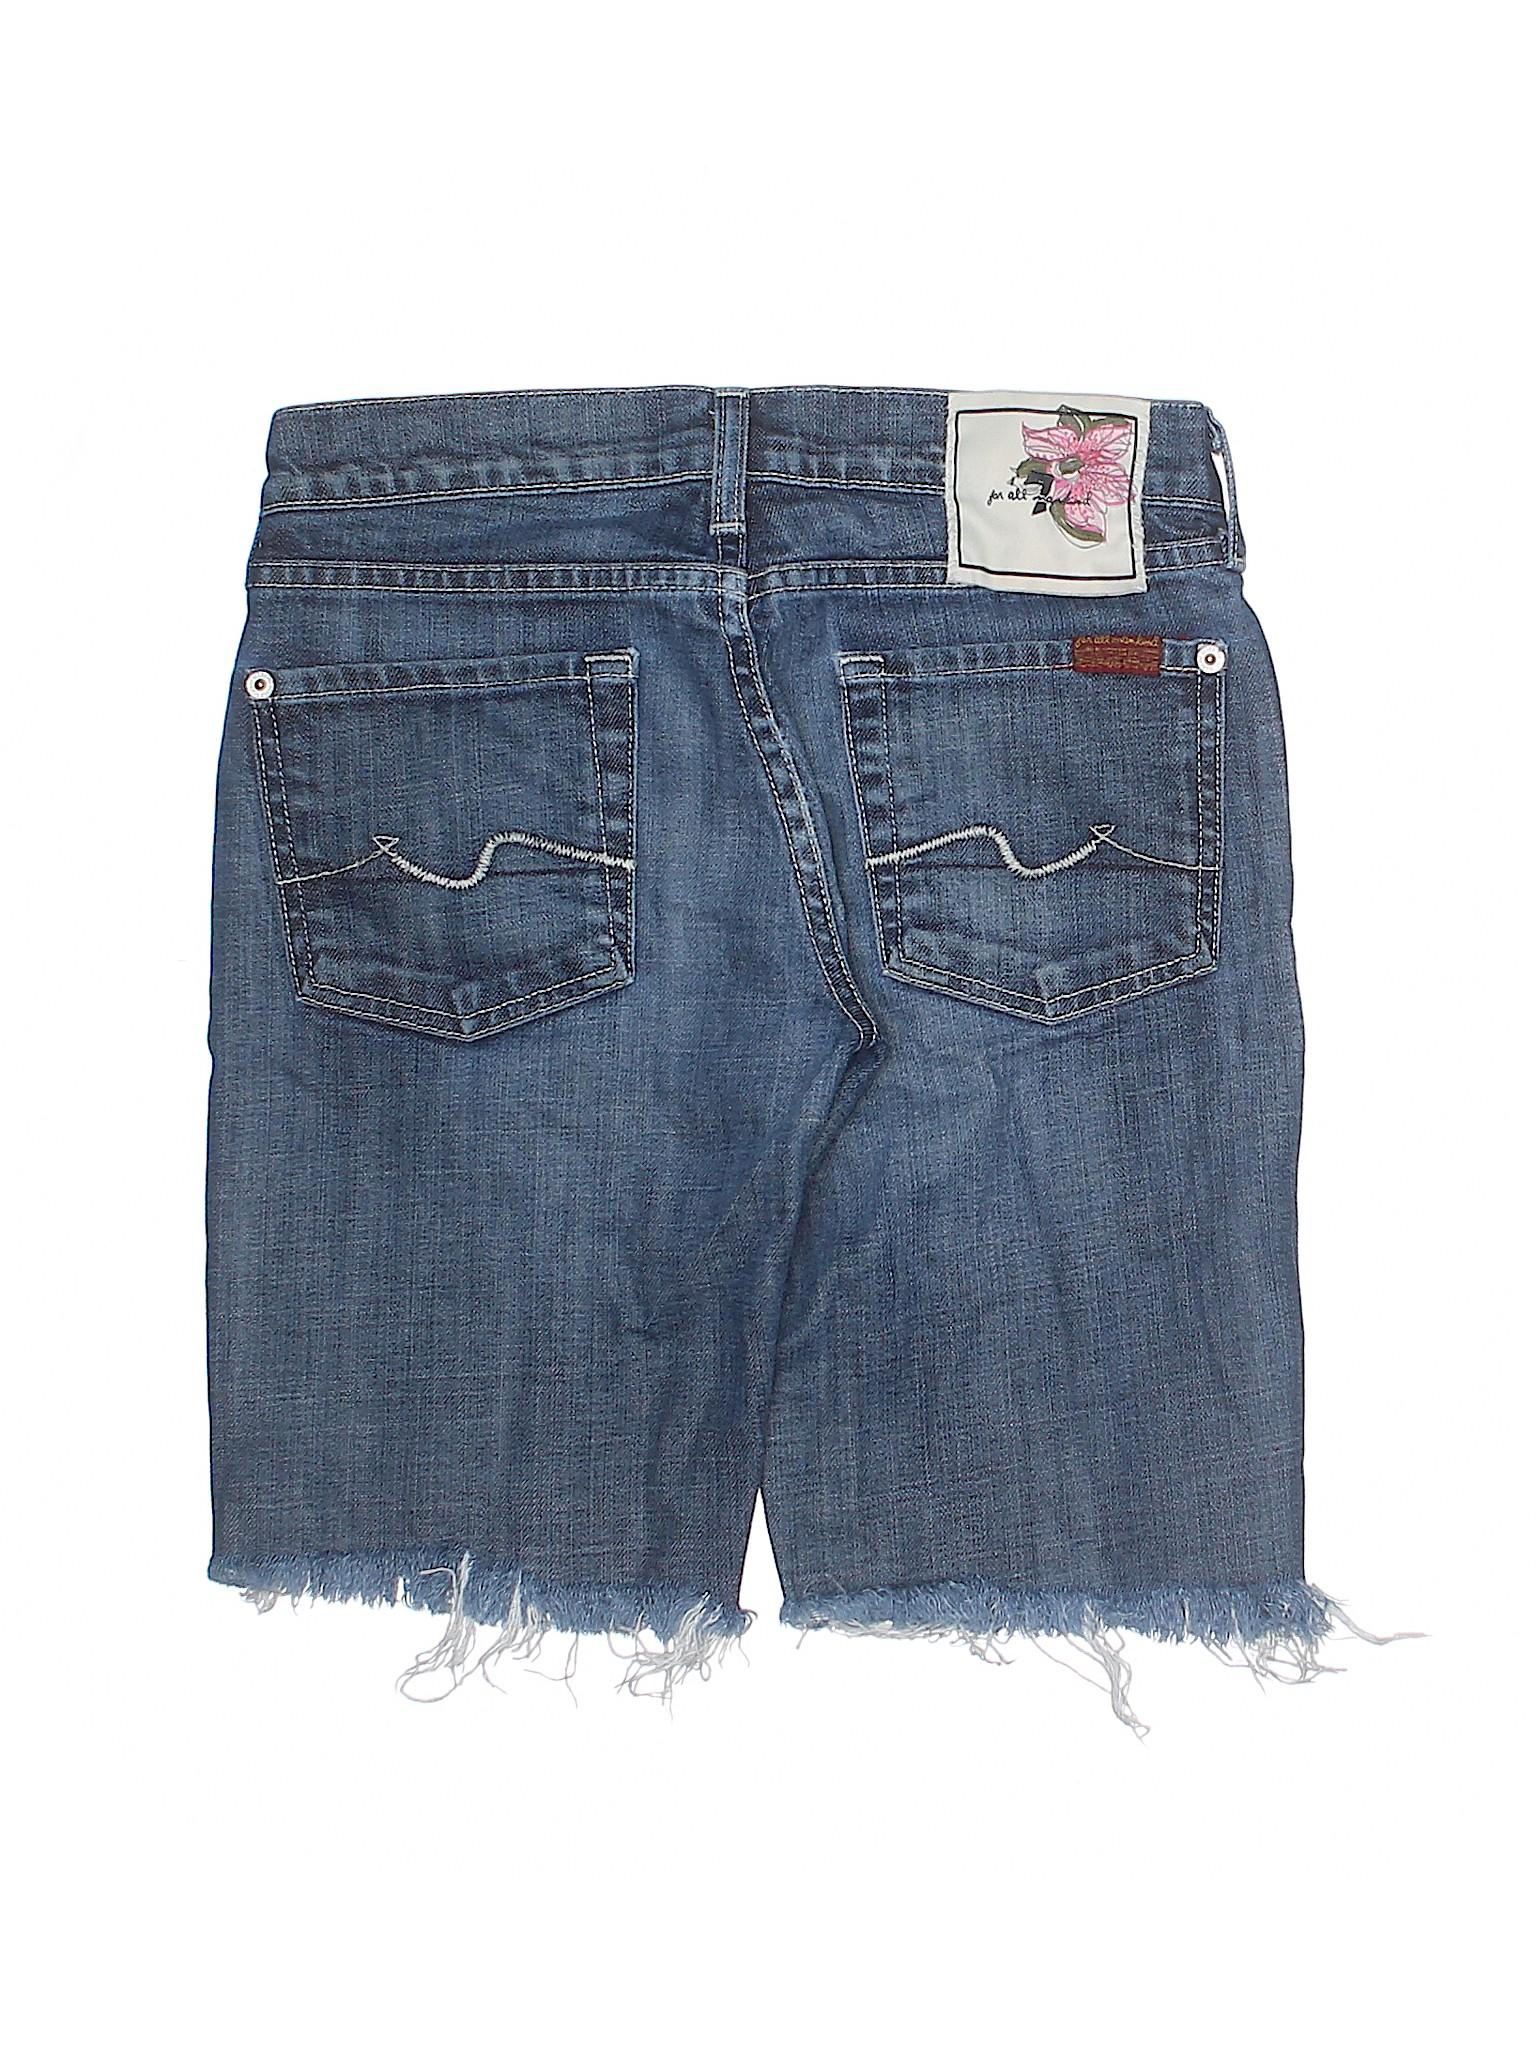 Leisure All Denim Shorts For winter 7 Mankind qwqZTp6